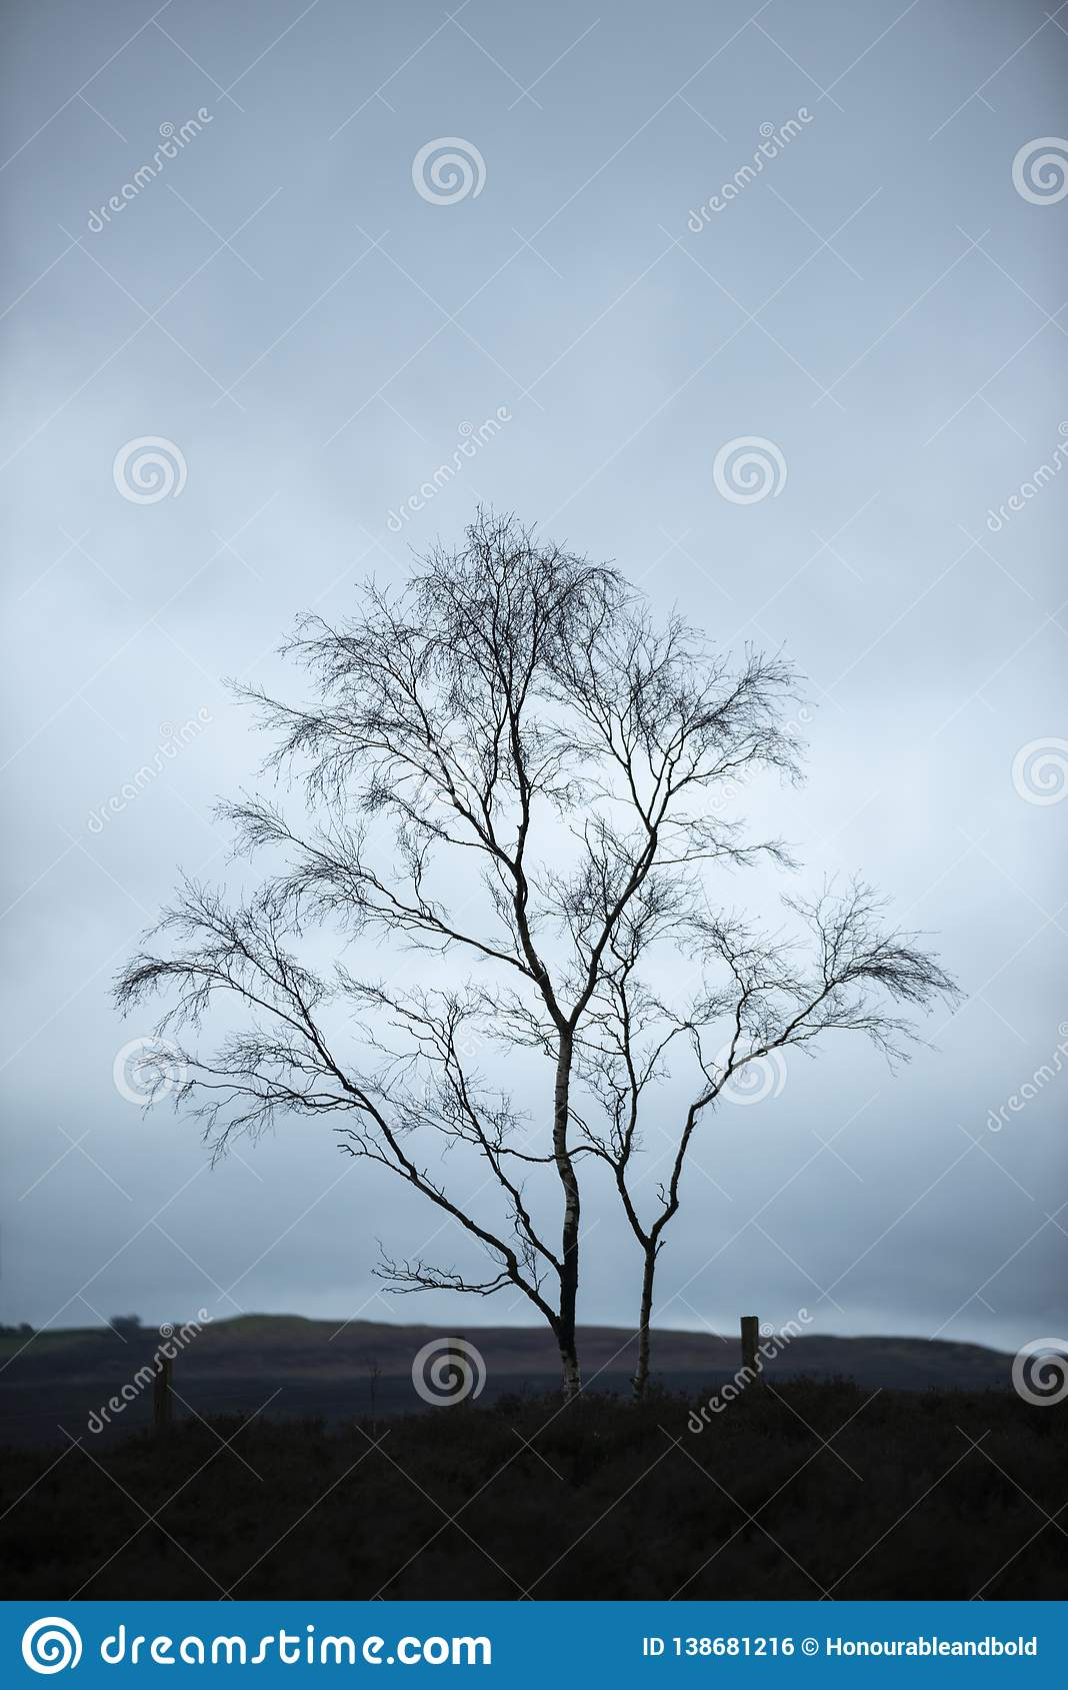 Moody Winter landscape image of skeletal trees in Peak District in England against dramatic dark sky